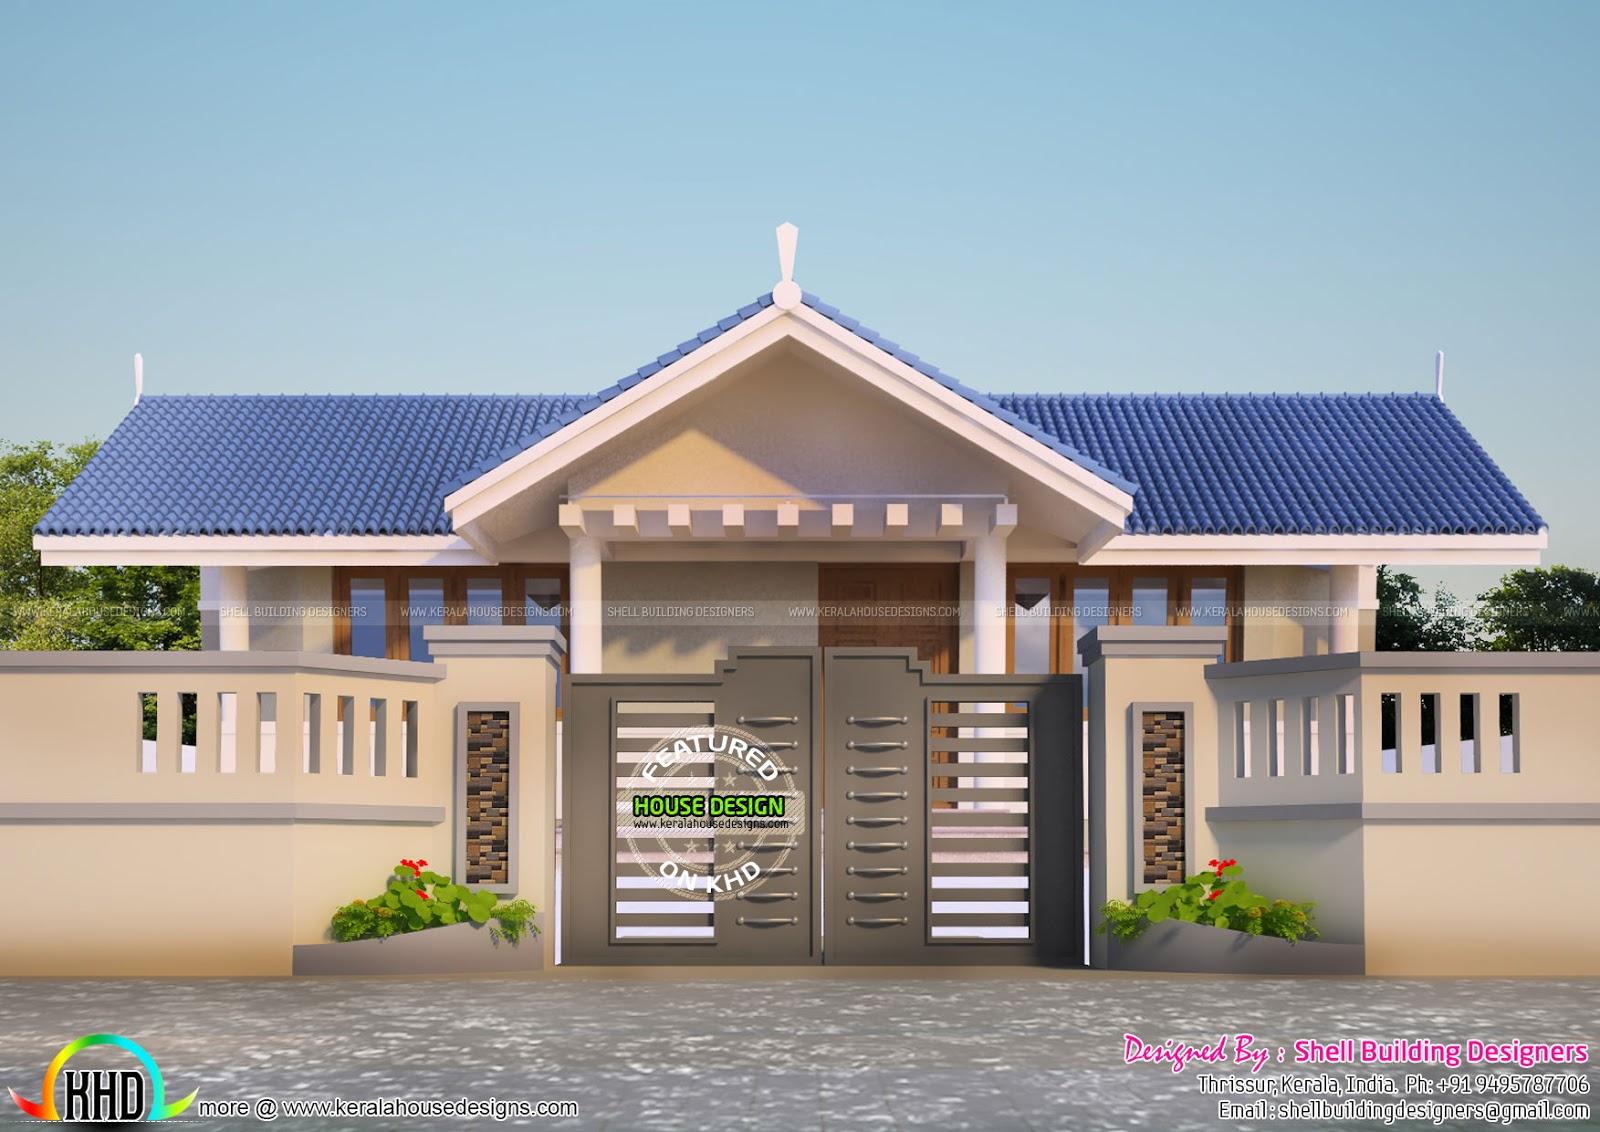 House Plans 2017 Sloping Roof Kerala Home Design Bloglovin'